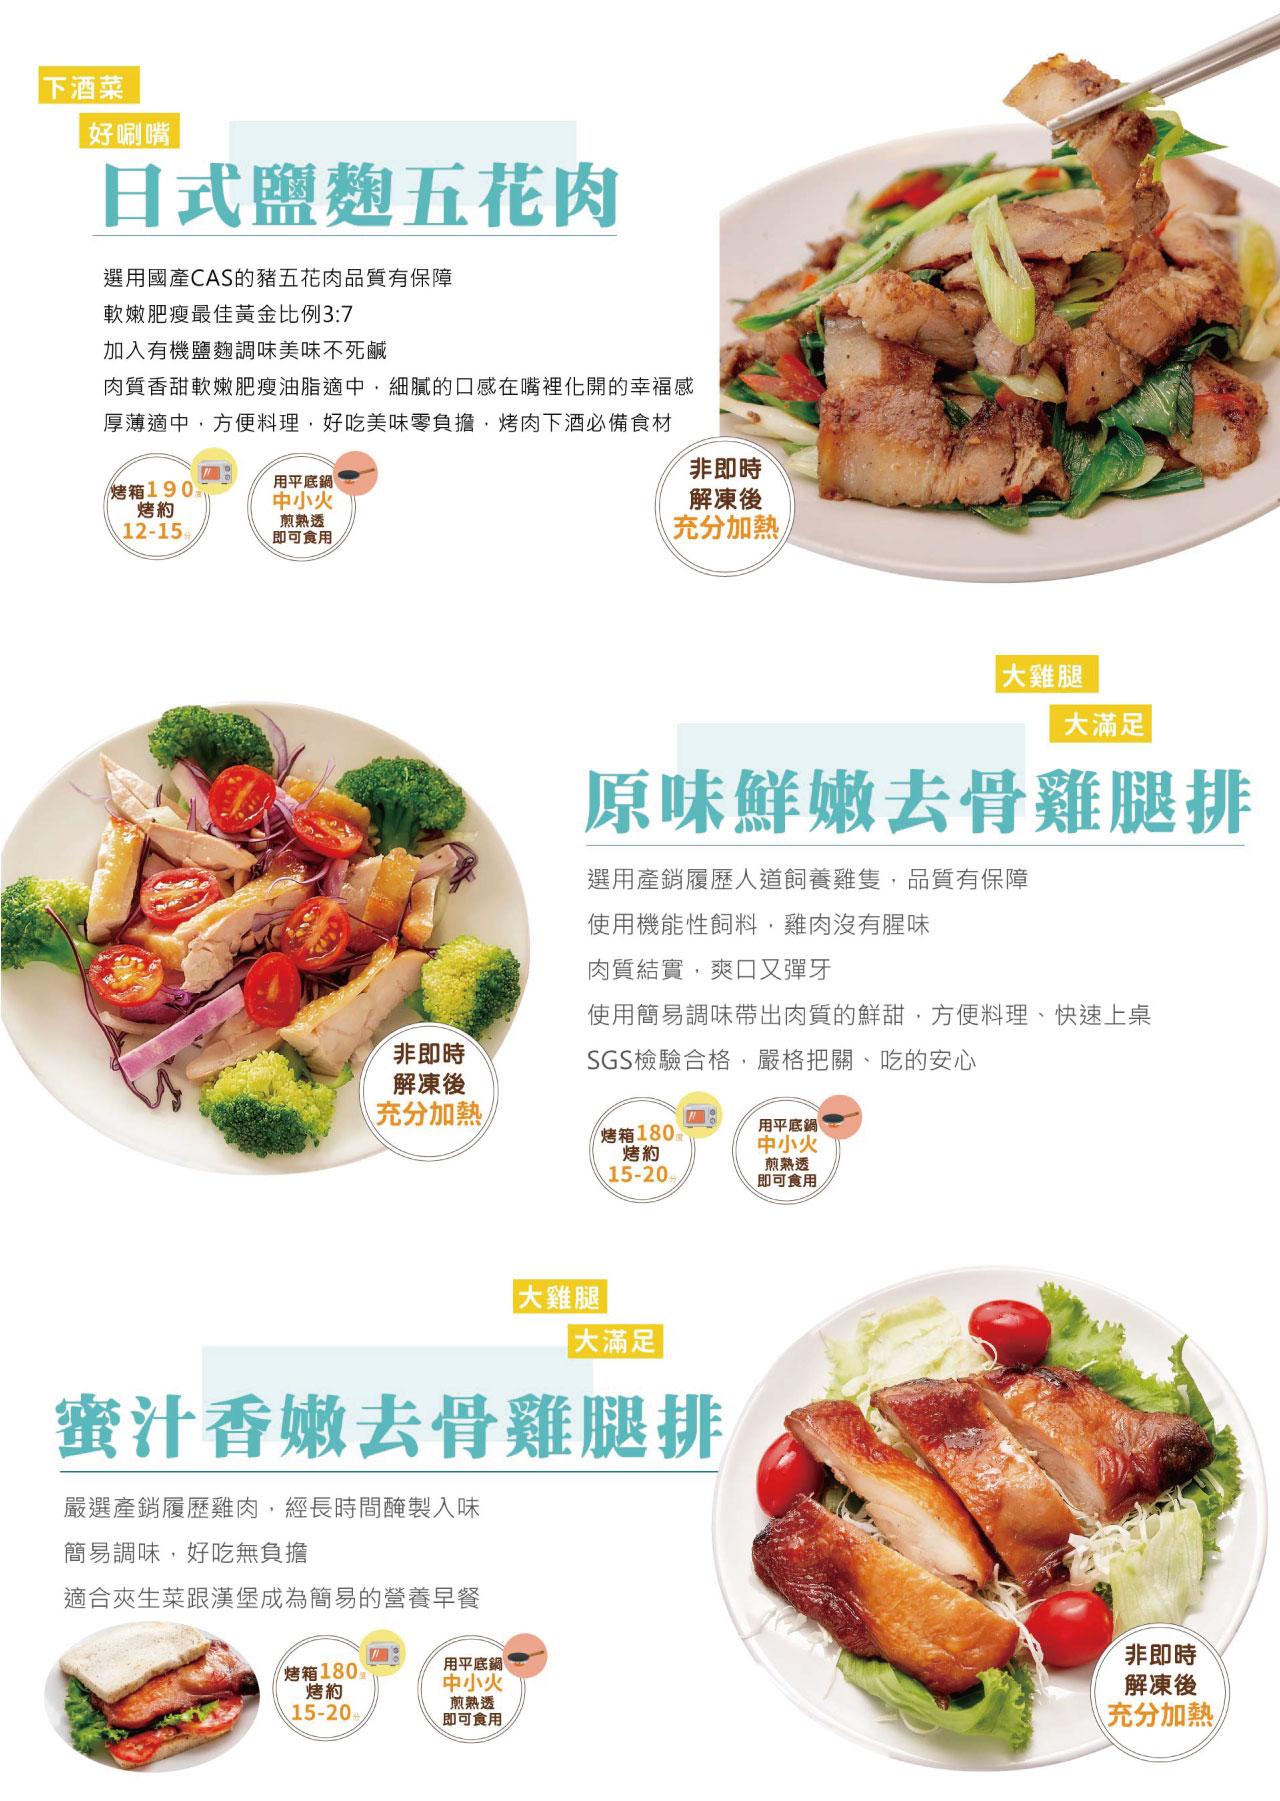 珍好食-1280-03-1